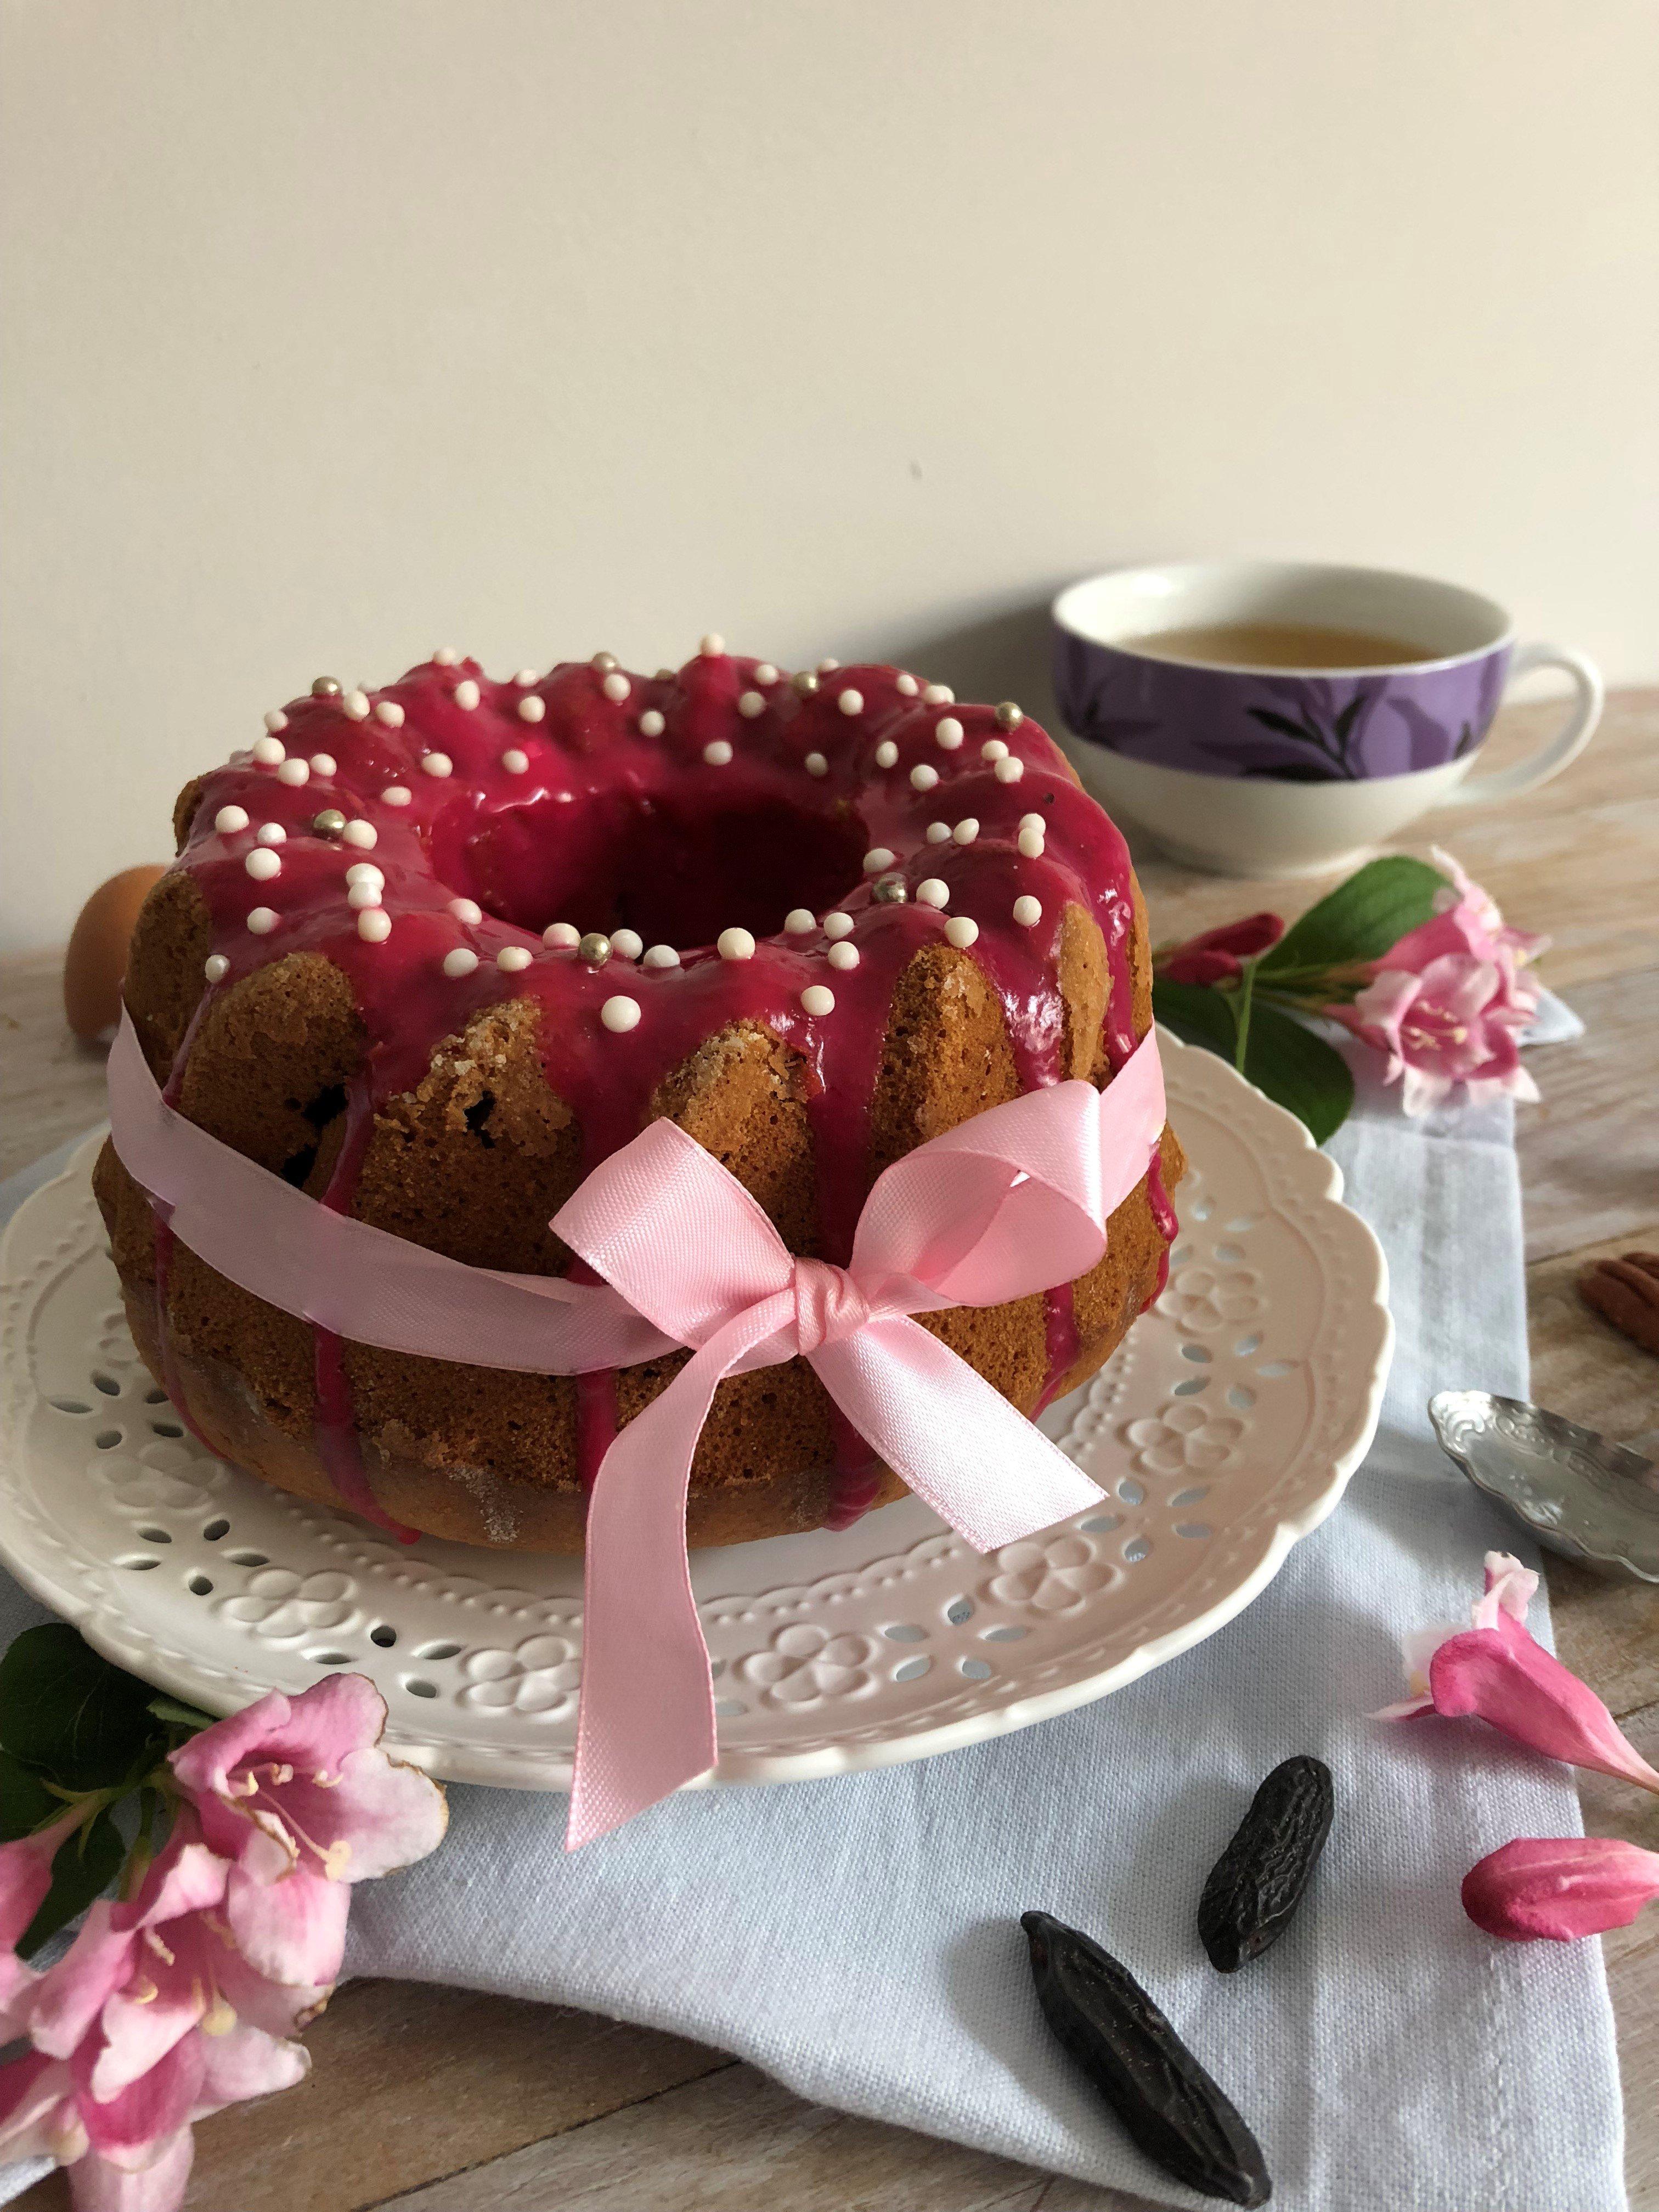 Gâteau au yaourt cerise, pécan et tonka